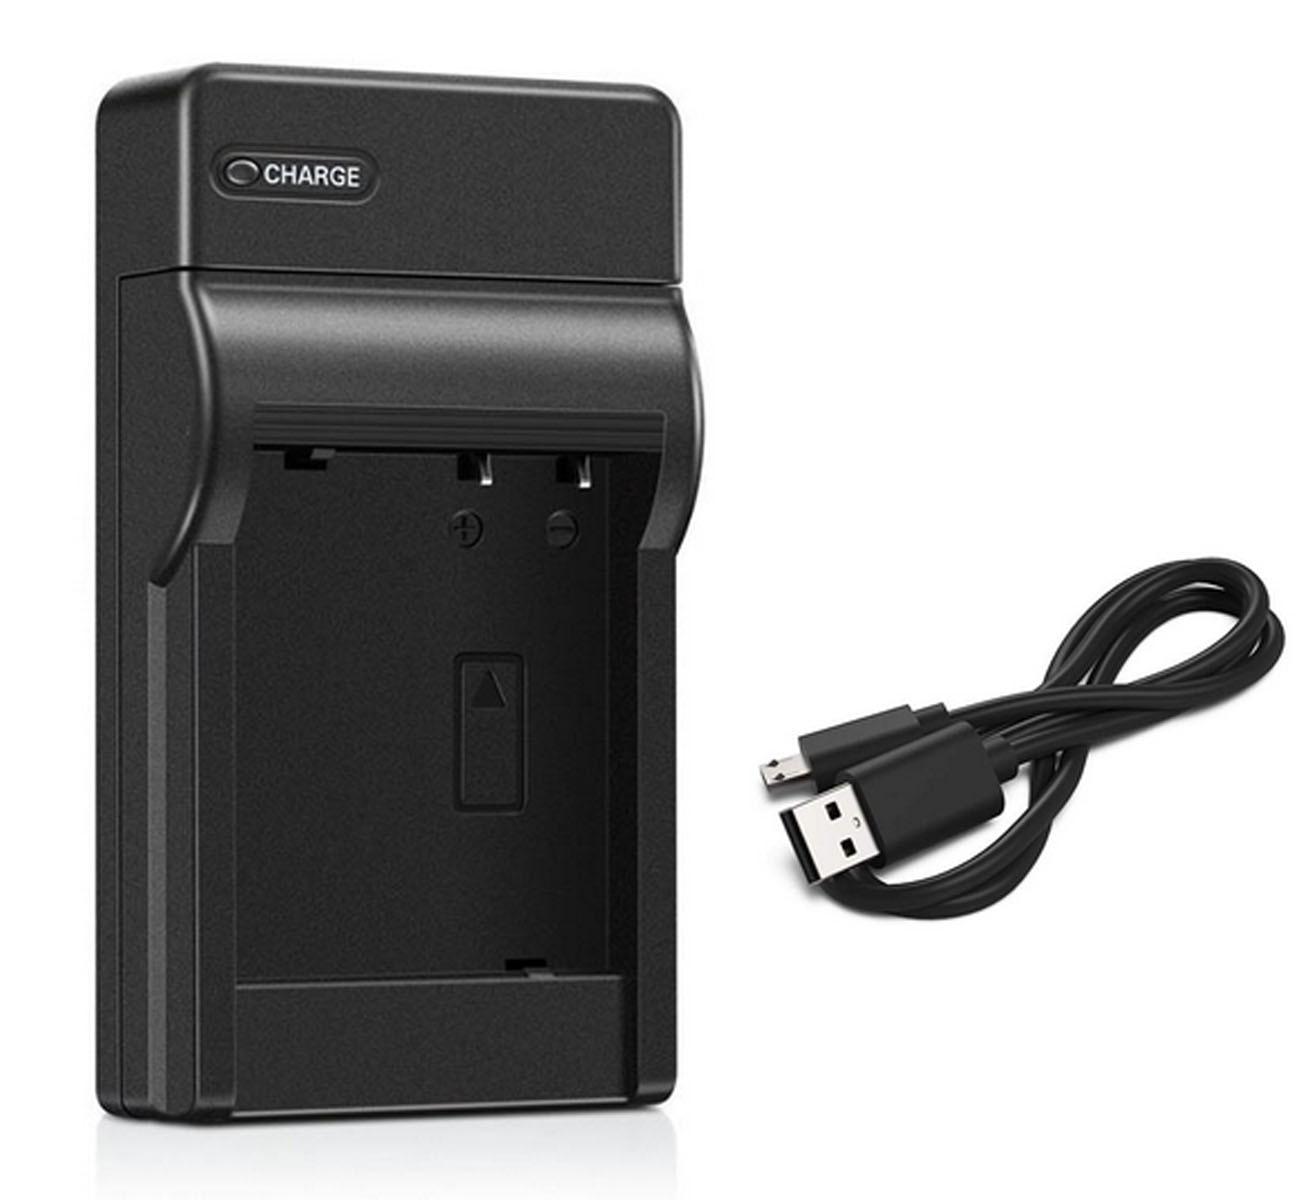 Quality Battery charger LI50B /& USB cable Olympus SP-720 SH21 digital cameras